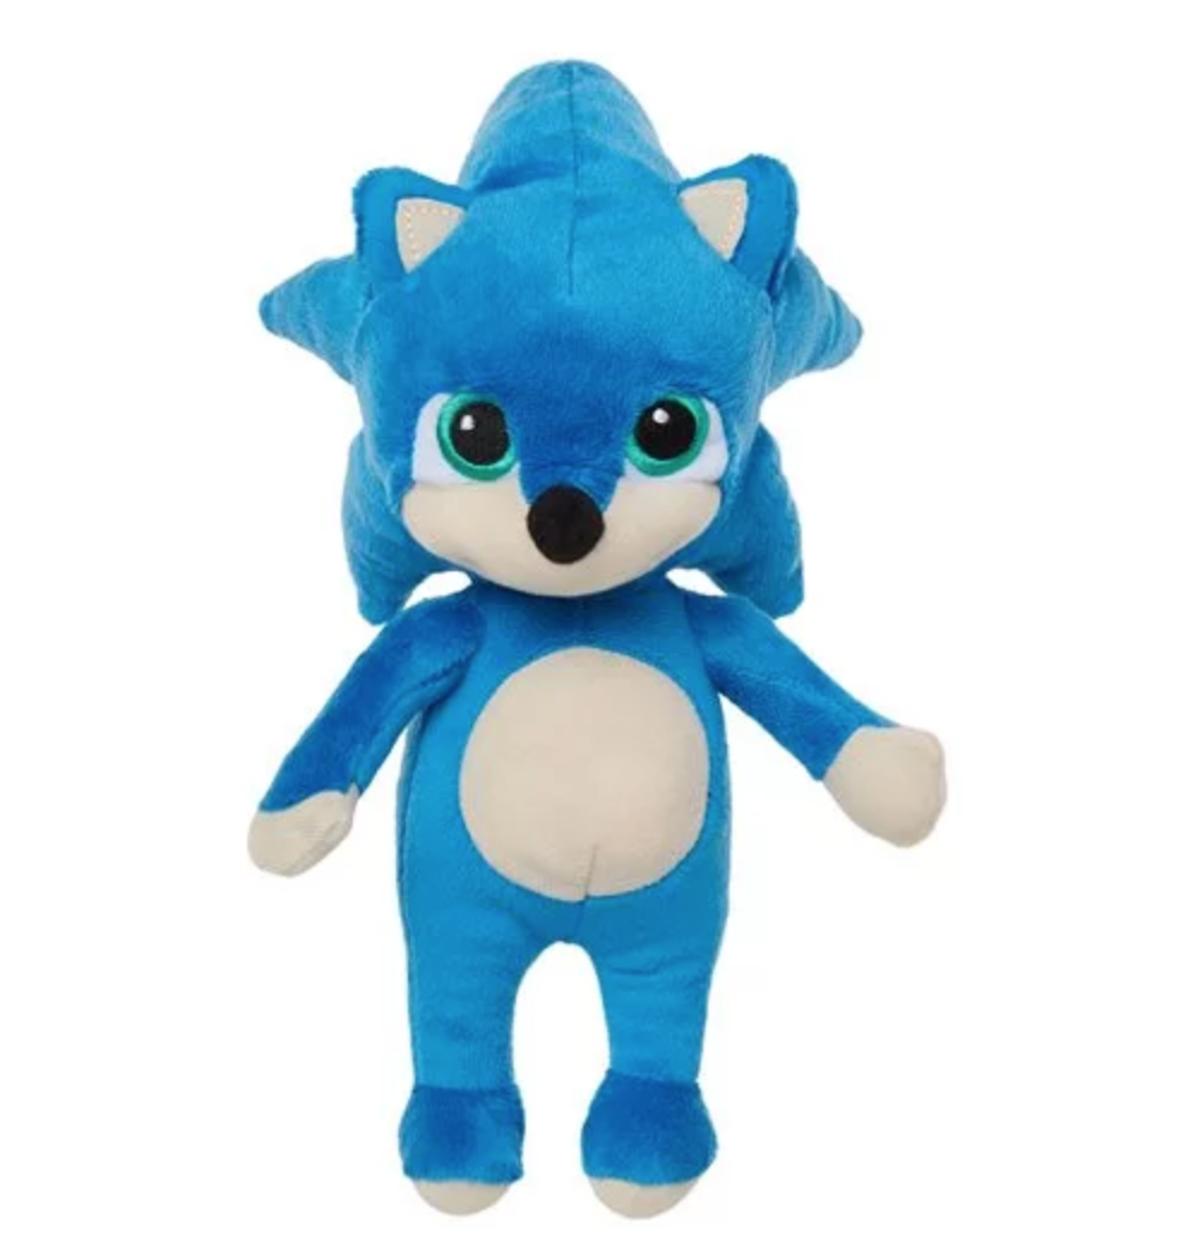 Baby Sonic plush doll